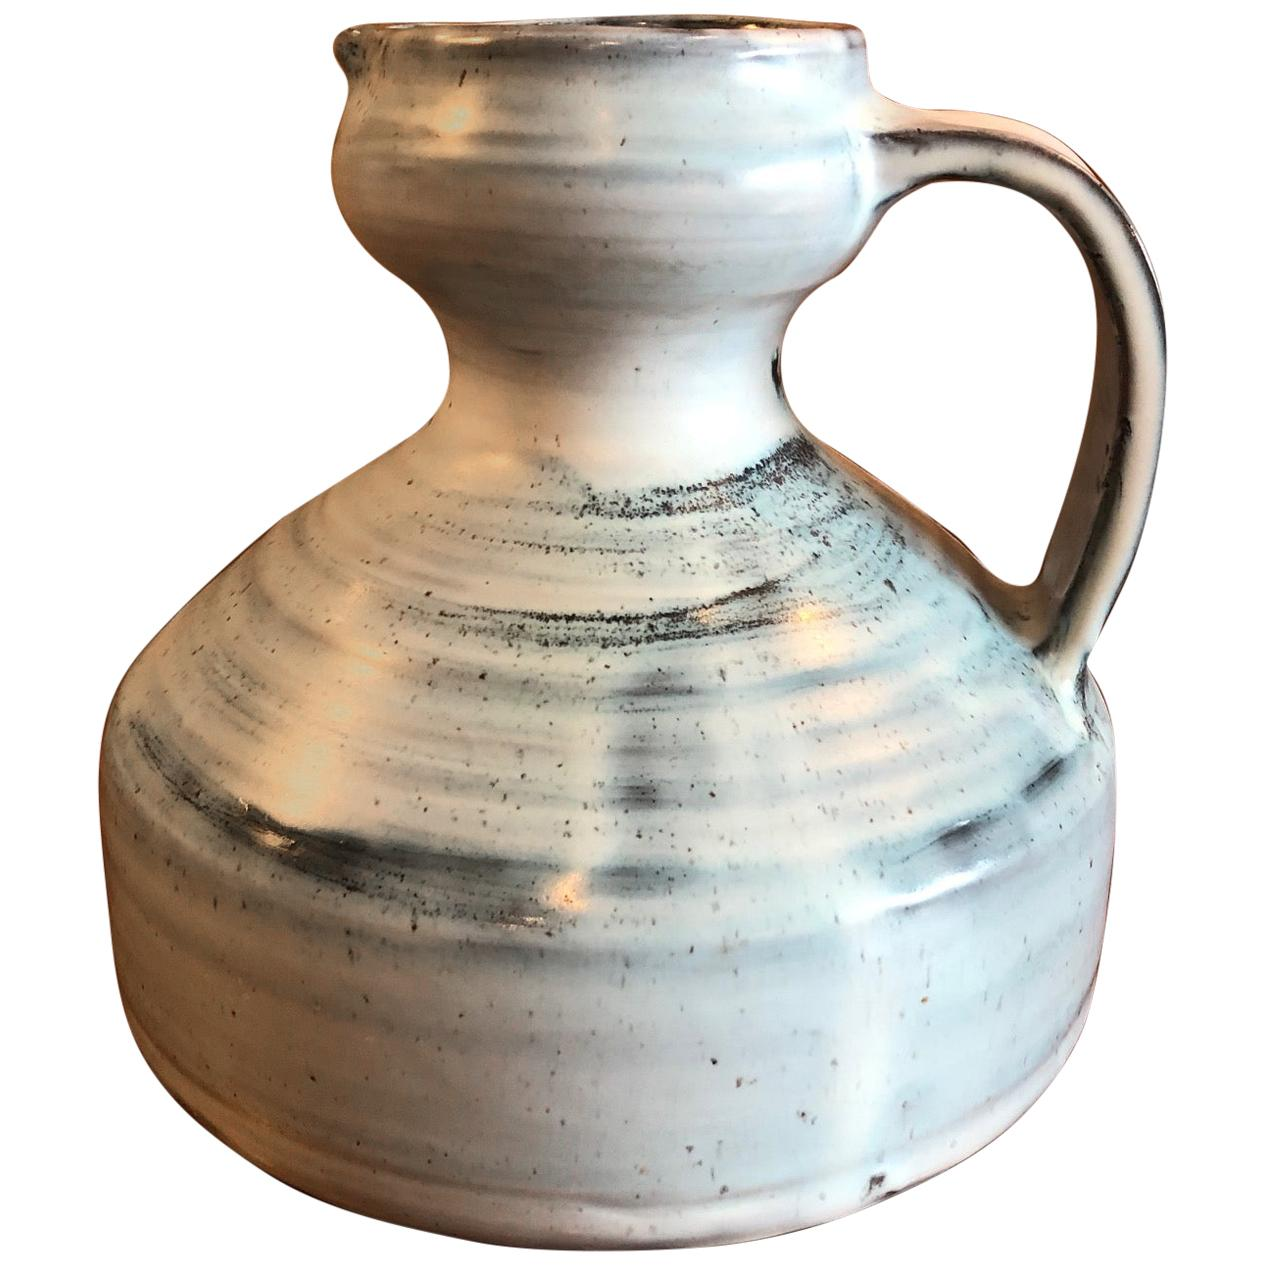 Ceramic Pitcher by Jacques Pouchain, France, 1960s